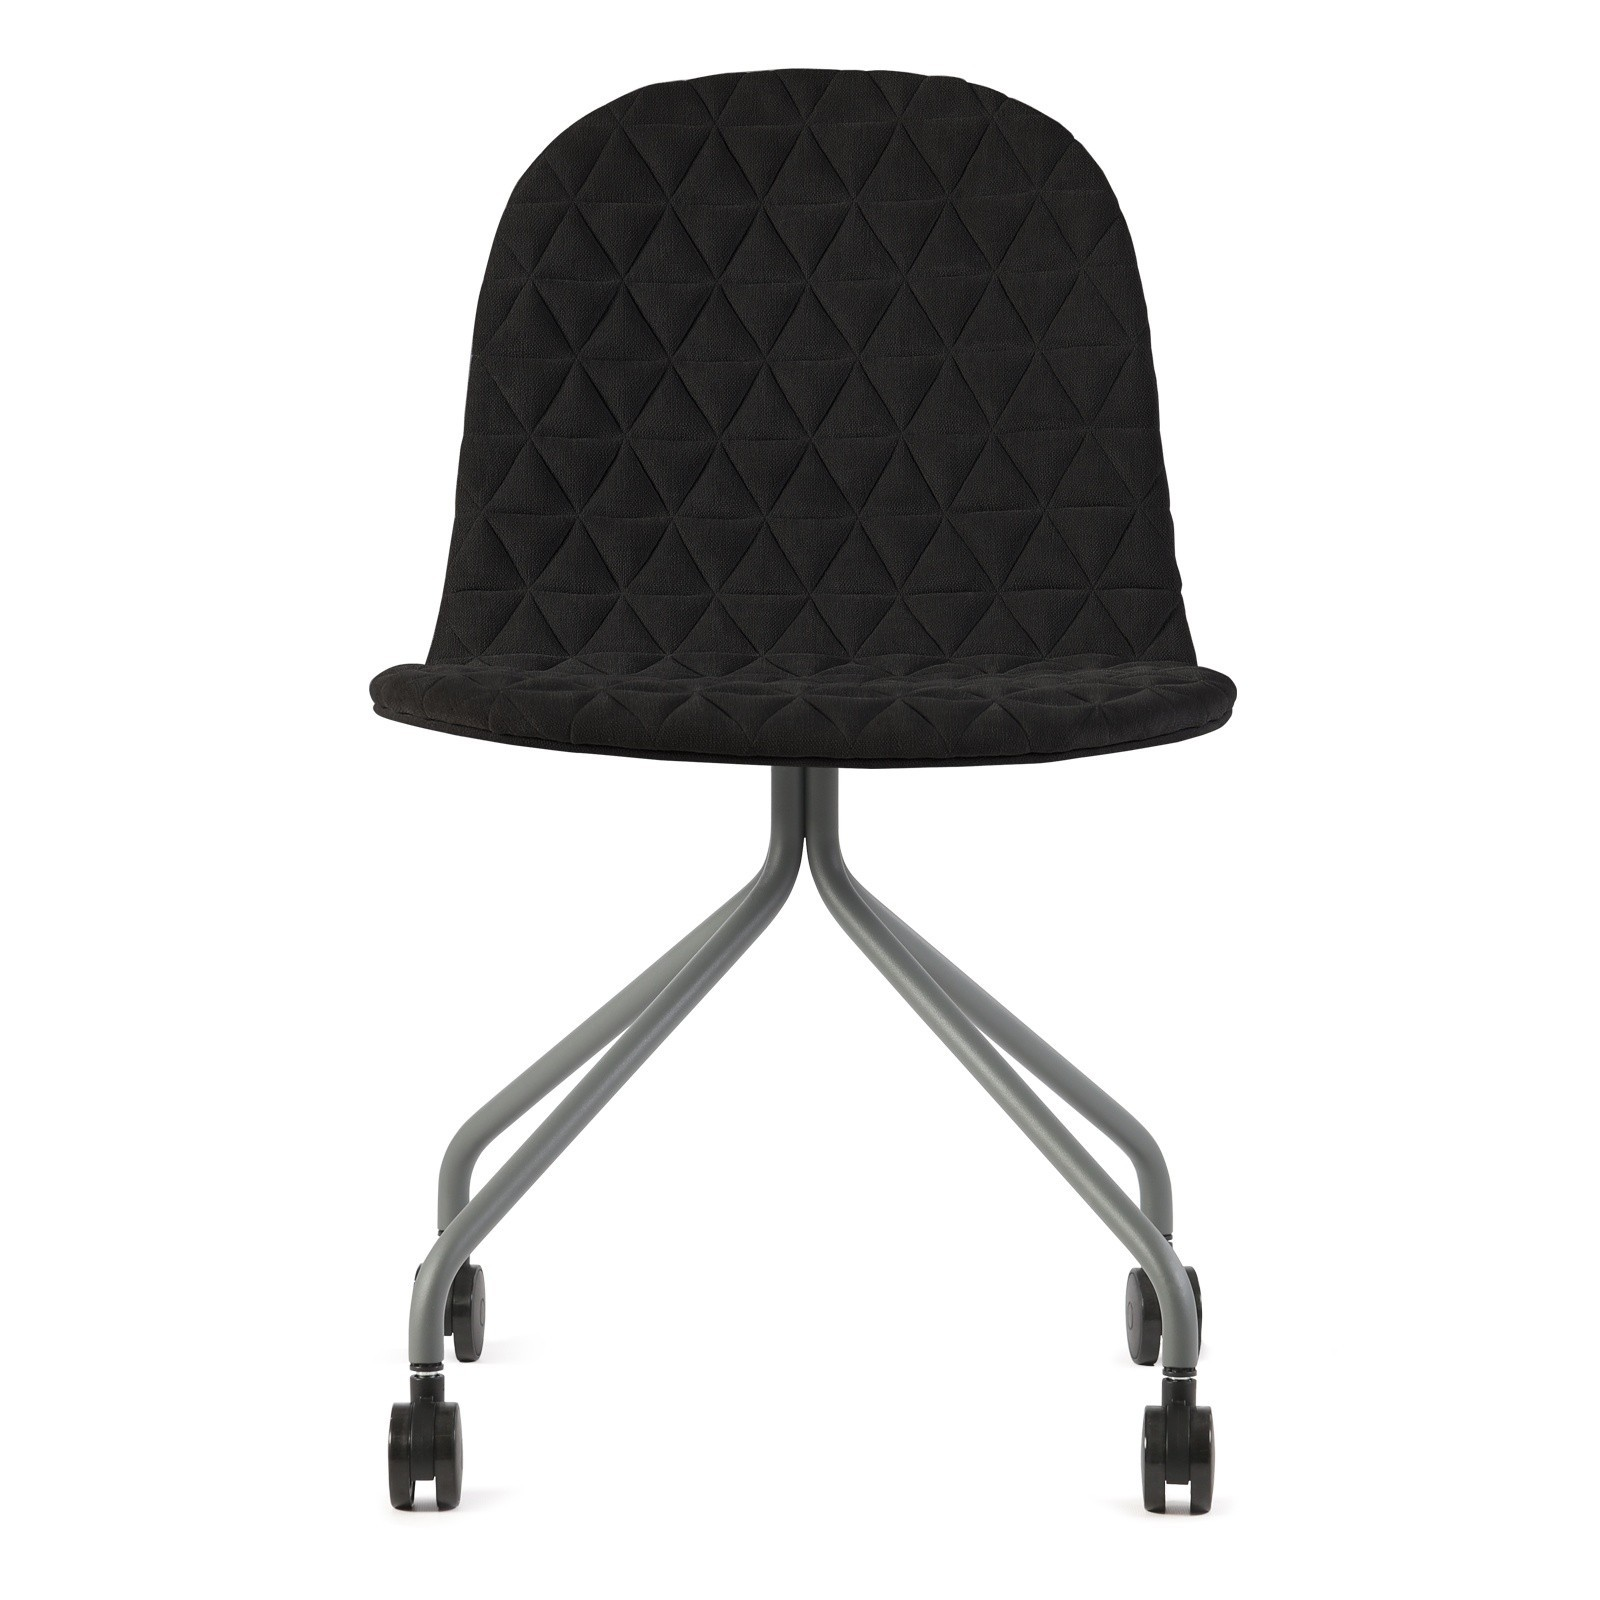 Mannequin chair - 04 - black